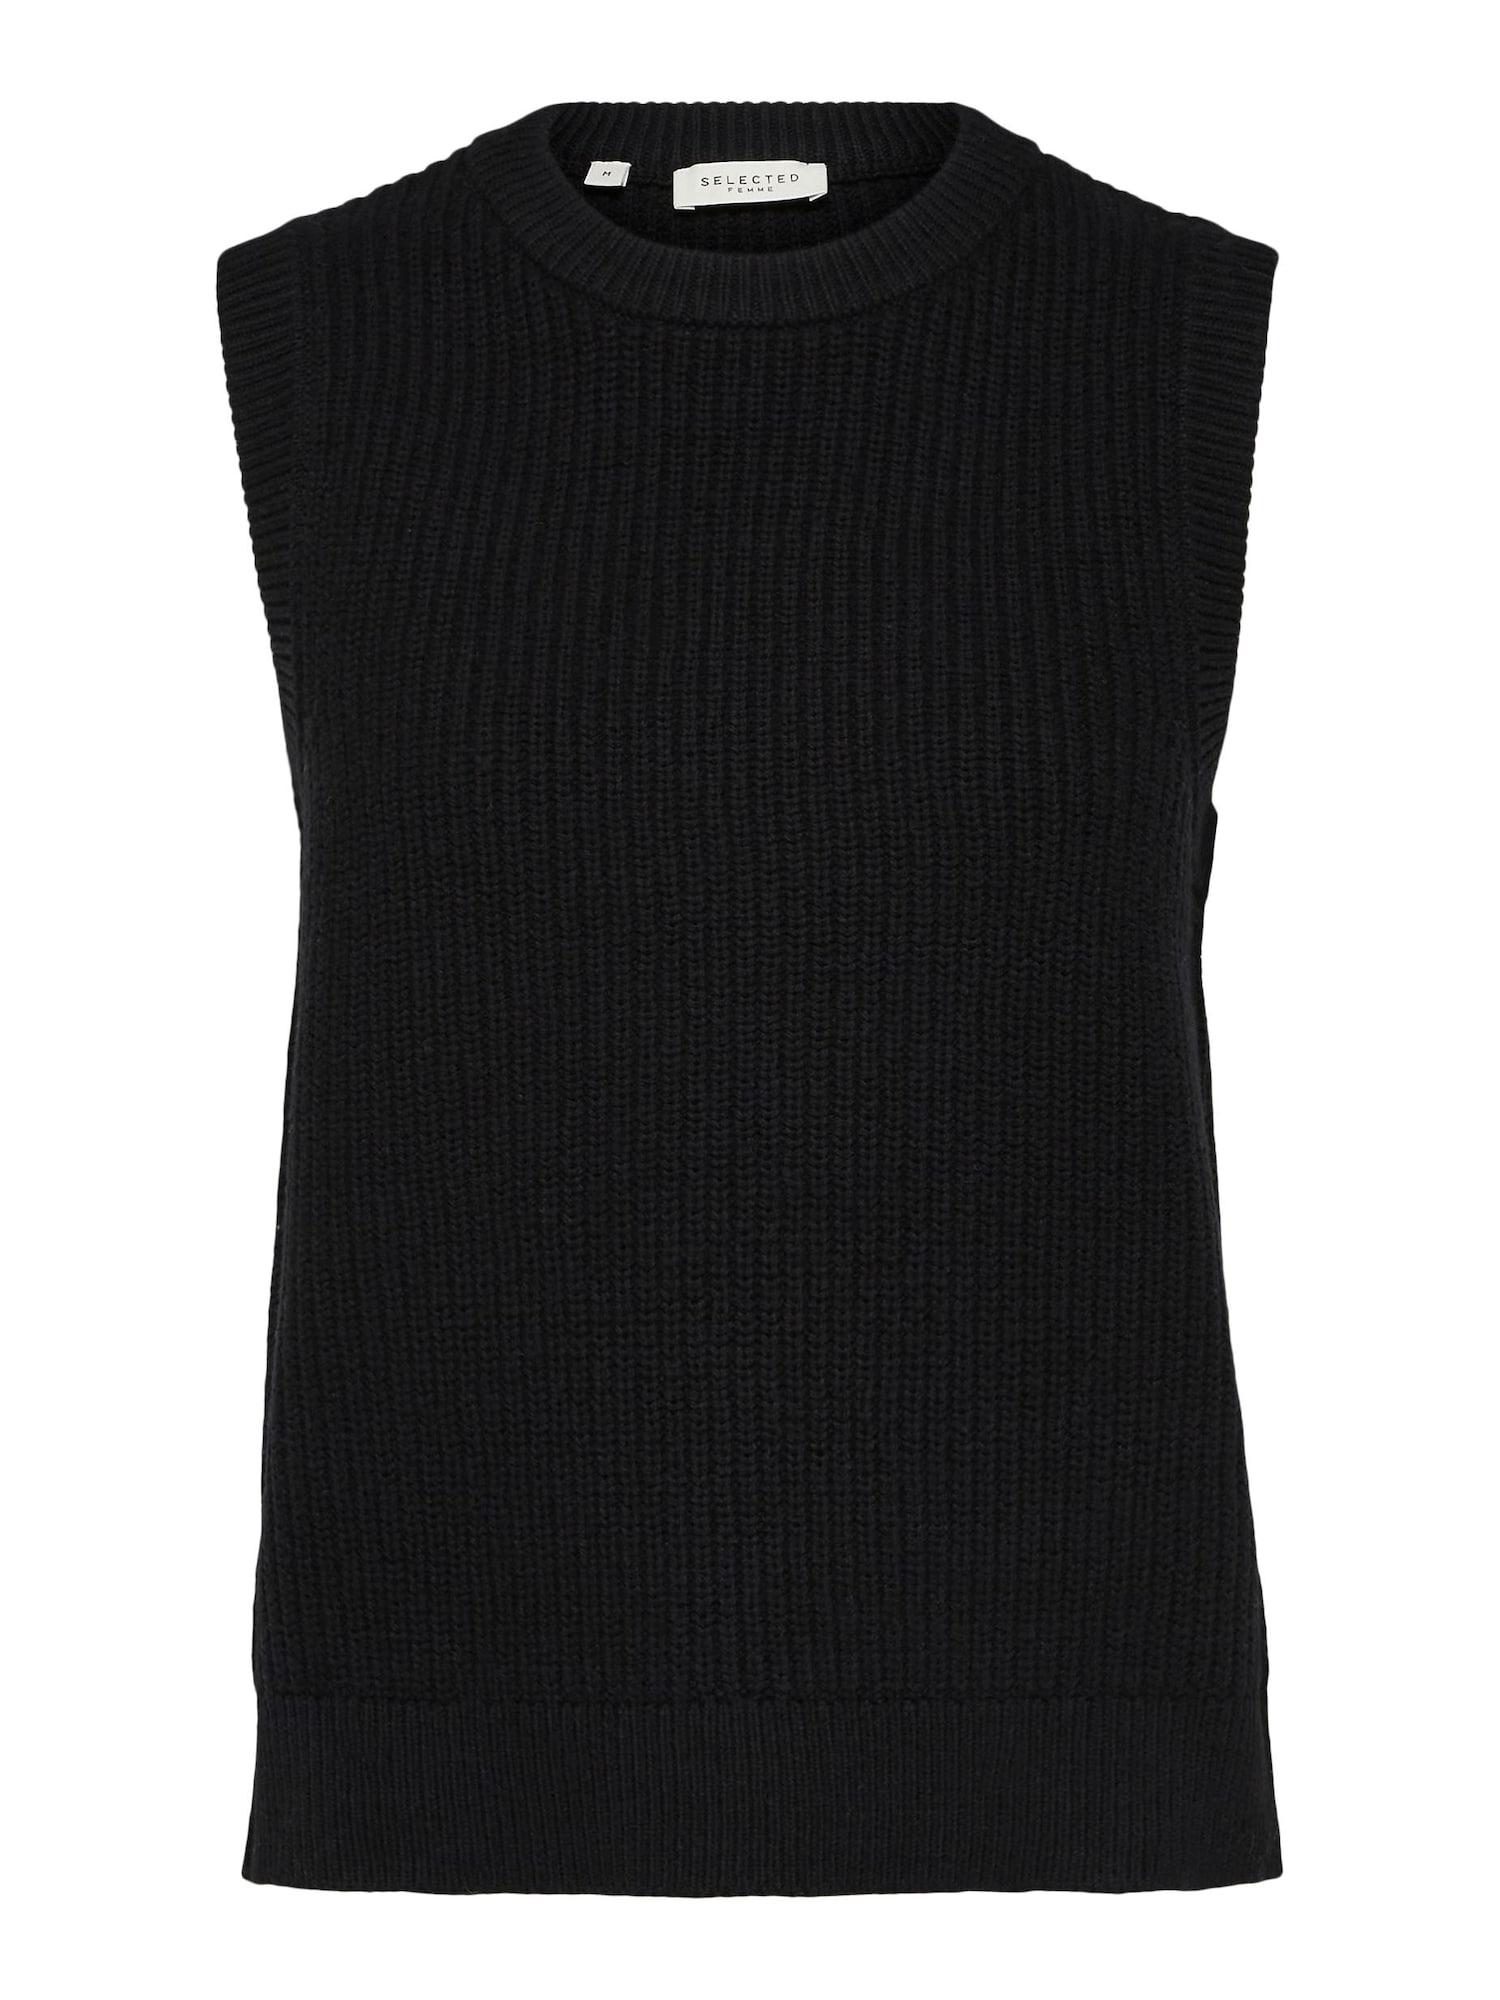 Selected Femme (Petite) Megztinis juoda